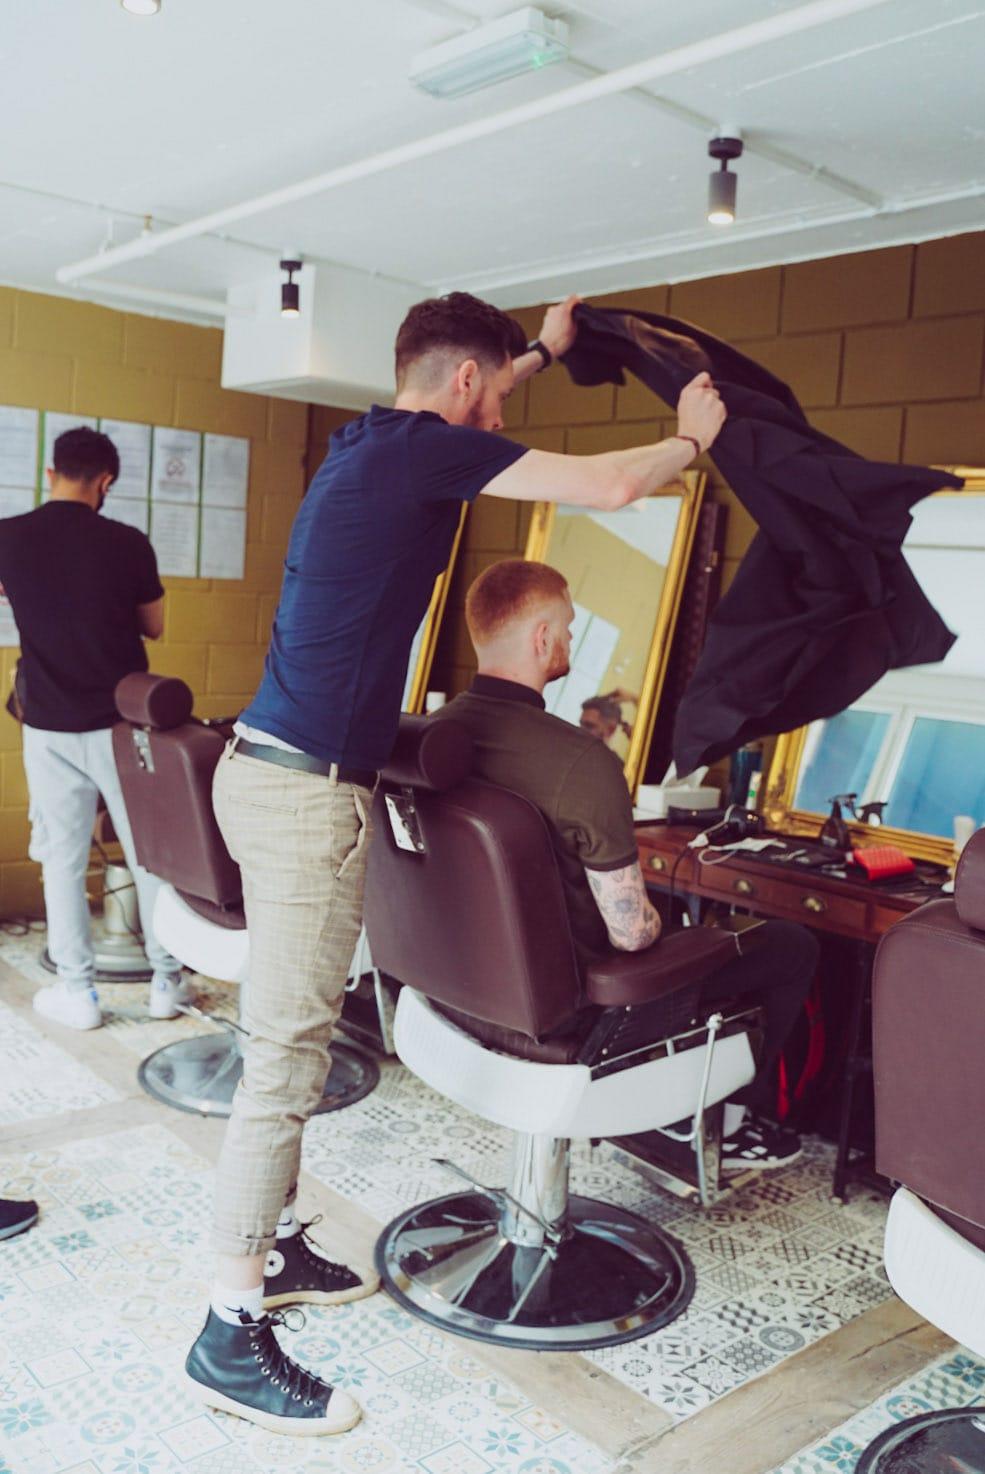 Student training at Strap & Scraper London Barber Academy